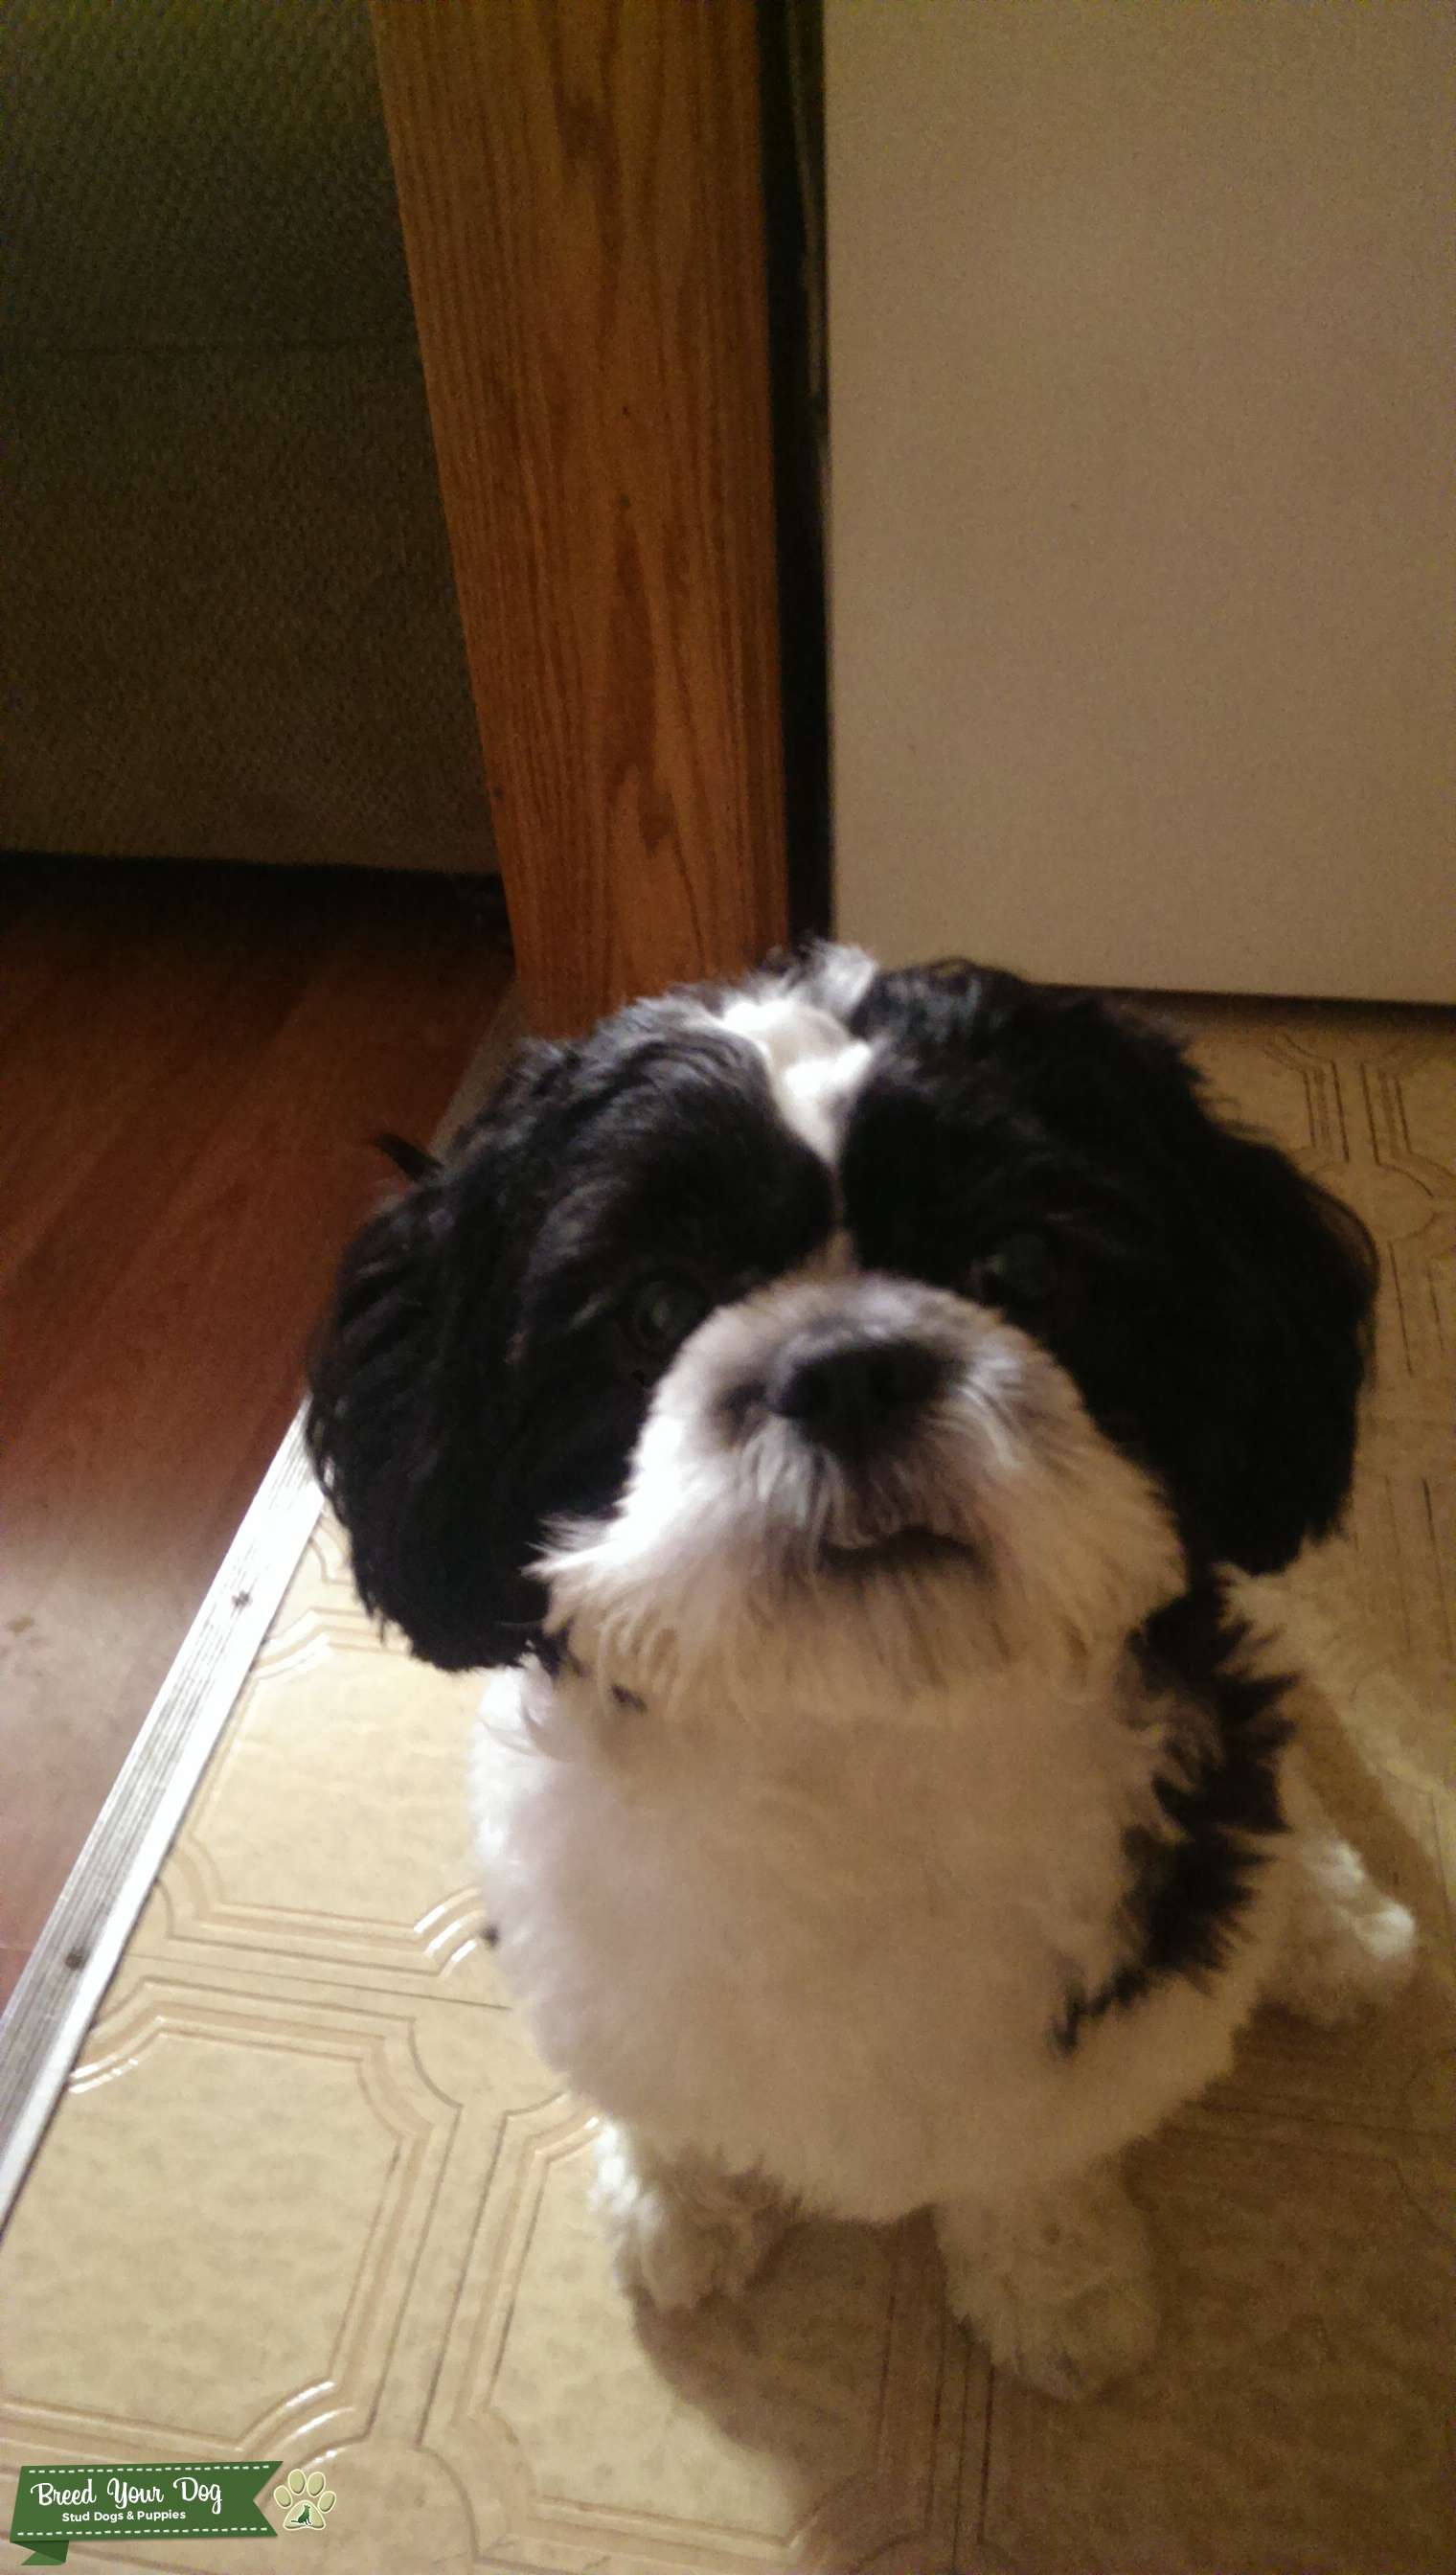 Stud Dog - Black and white Shih Tzu - Breed Your Dog